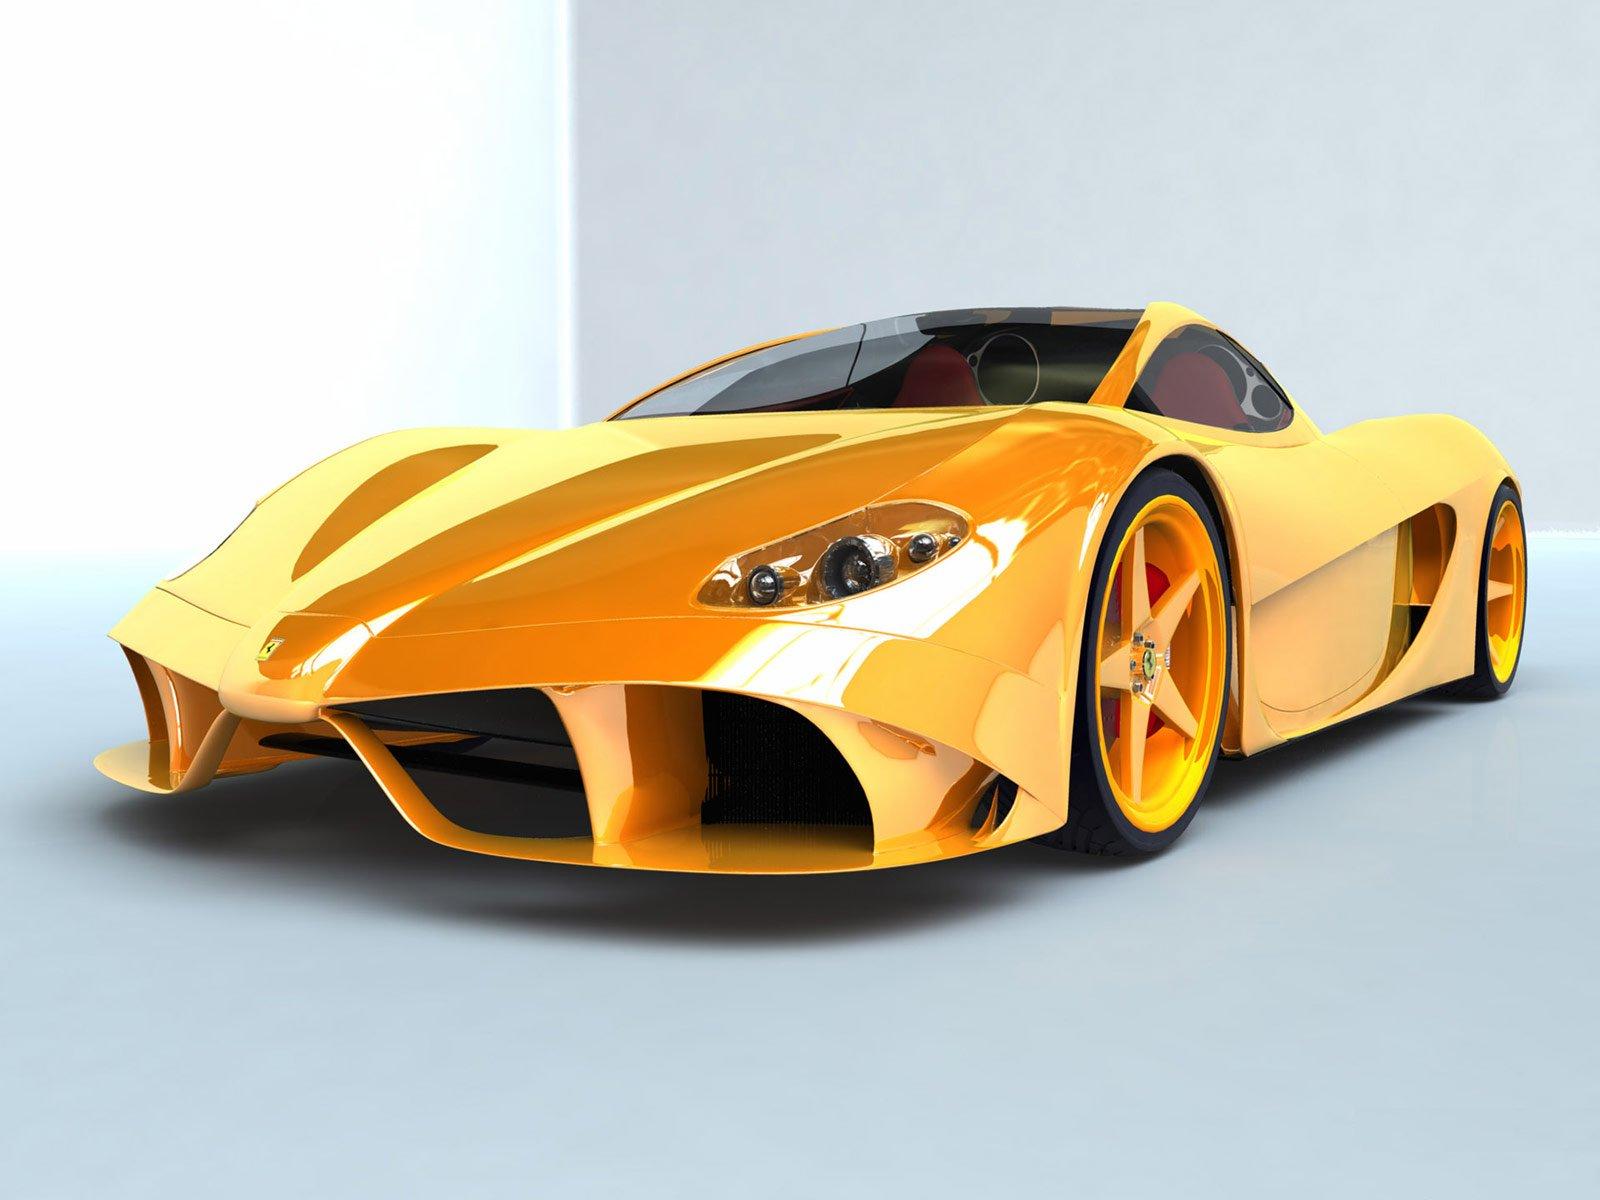 http://4.bp.blogspot.com/-xZoFKcjX42E/ThBLEgx62gI/AAAAAAAAFjA/1k8hzHKA1S8/s1600/Cars+wallpaper-1.jpg